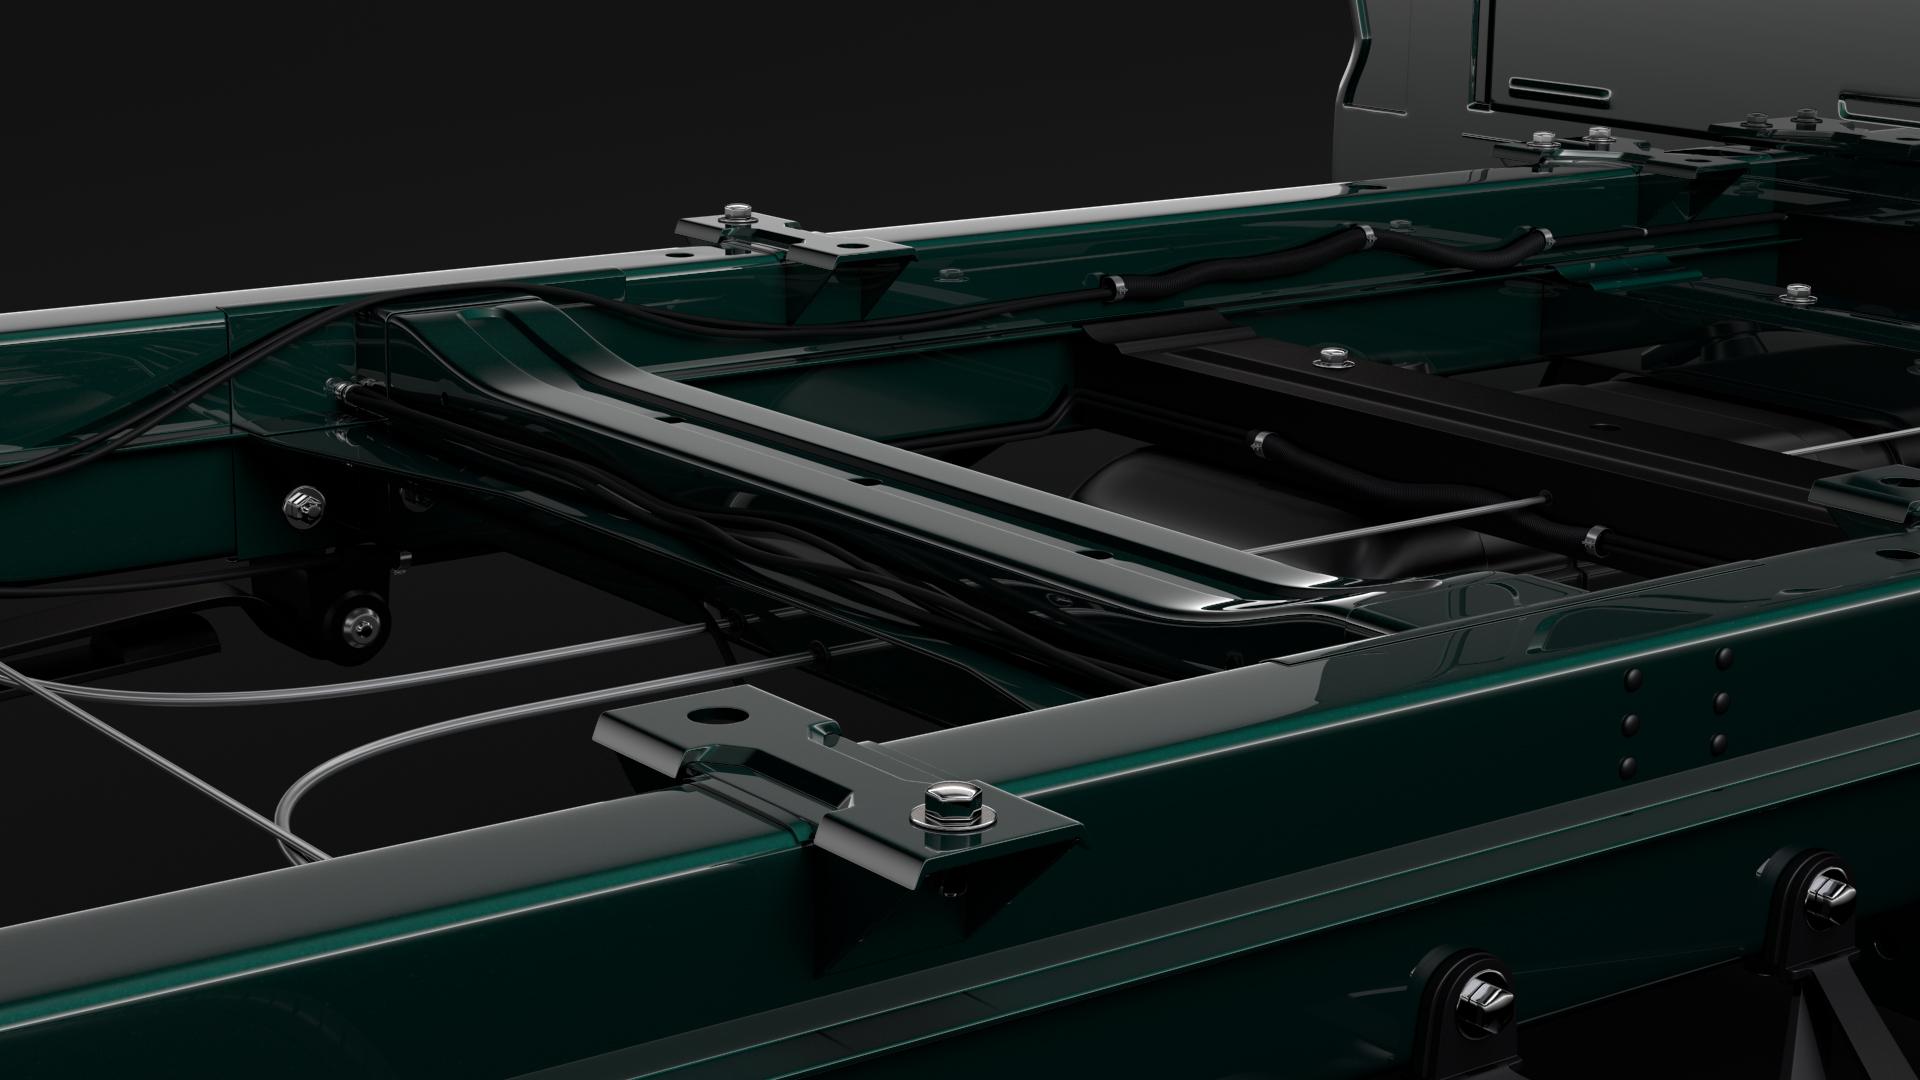 wv crafter chassis single-cab 2017 3d model max fbx c4d lwo ma mb hrc xsi obj 275101